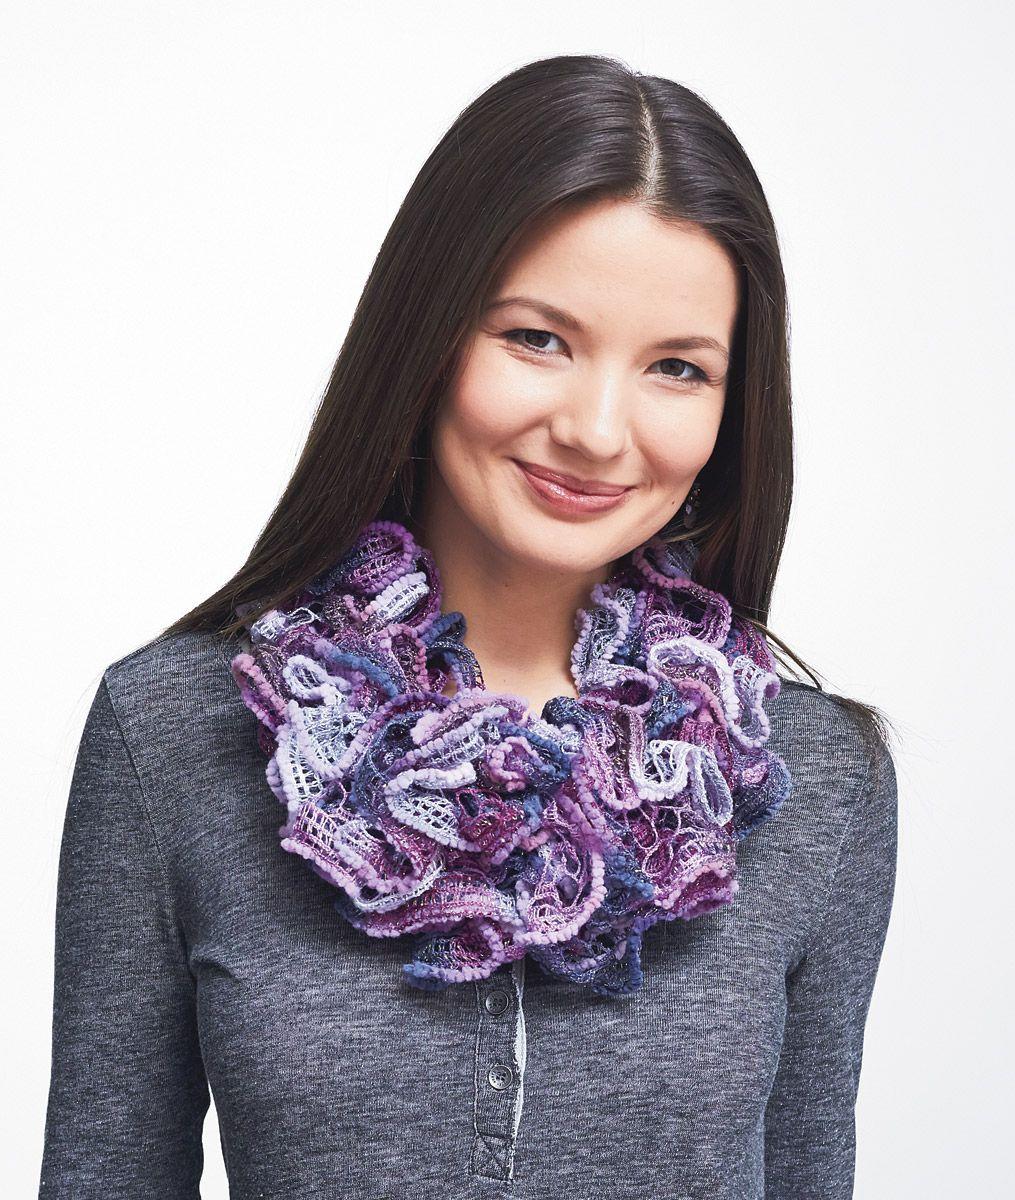 Patons Pirouette Cowl Knit Crochet Crochet Ruffle Scarf